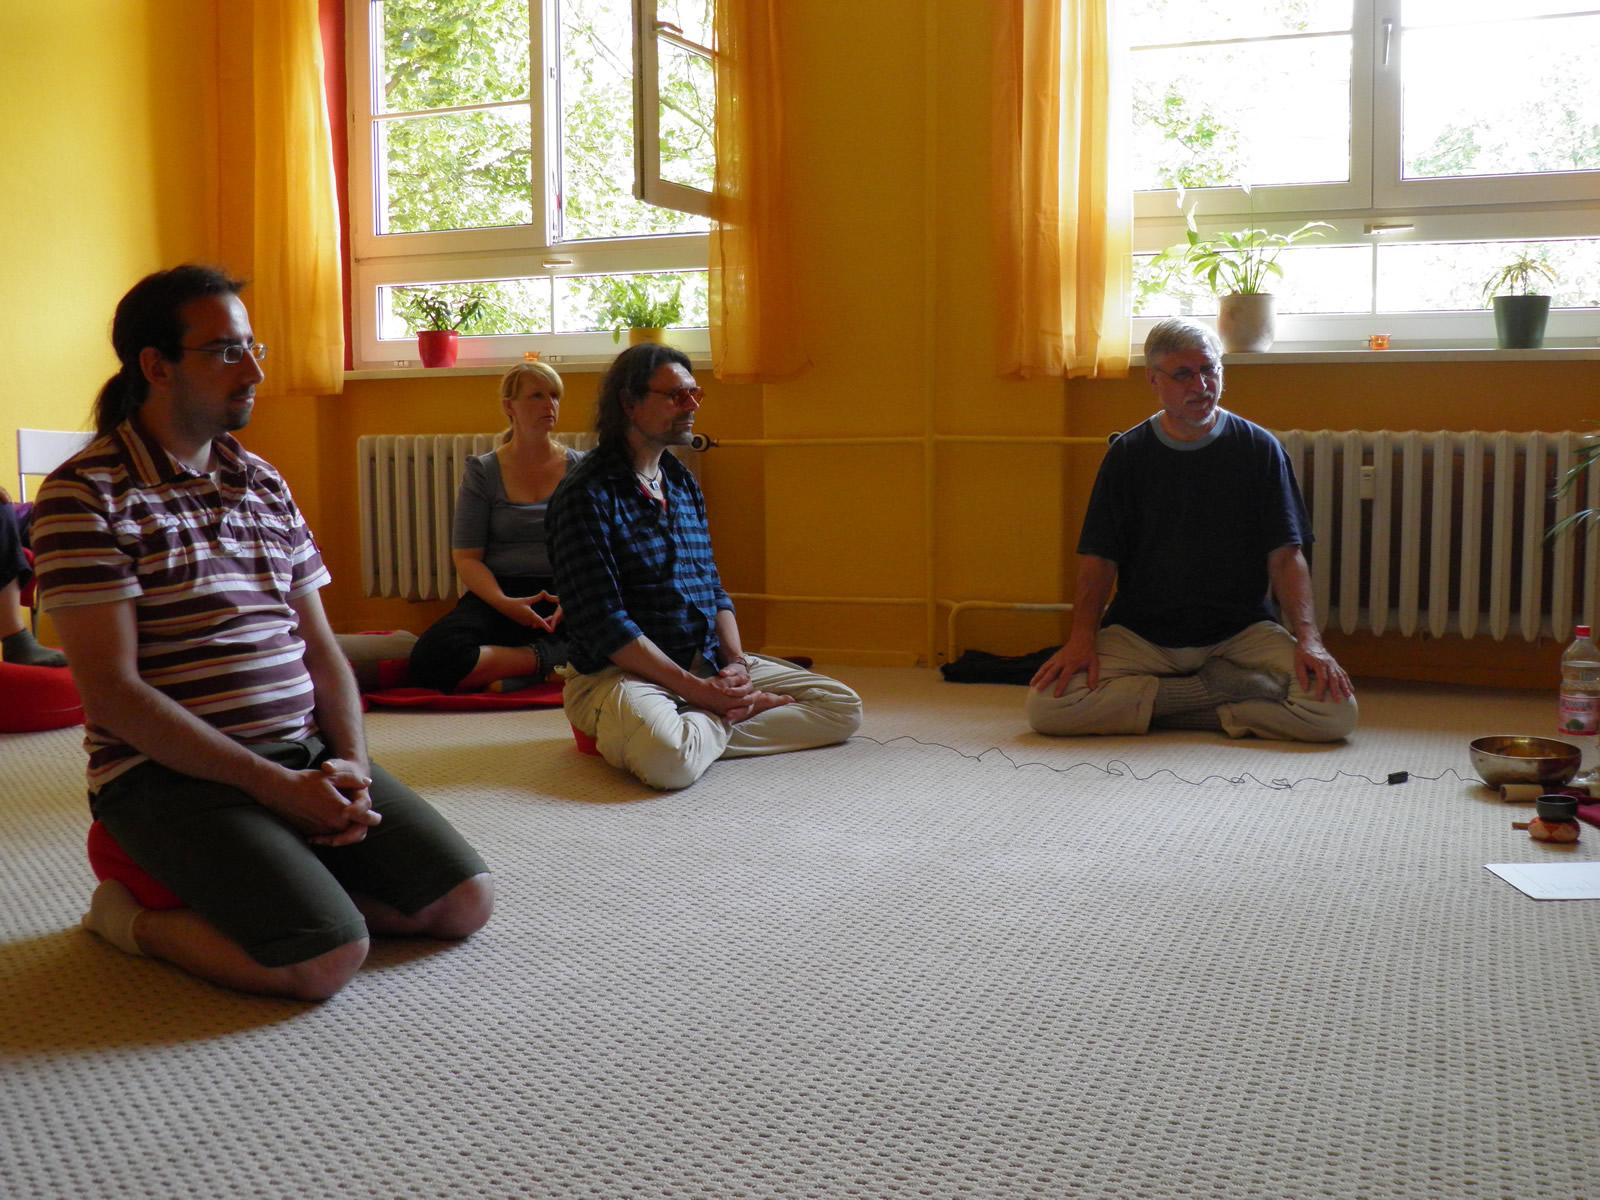 schweigen meditation berlin